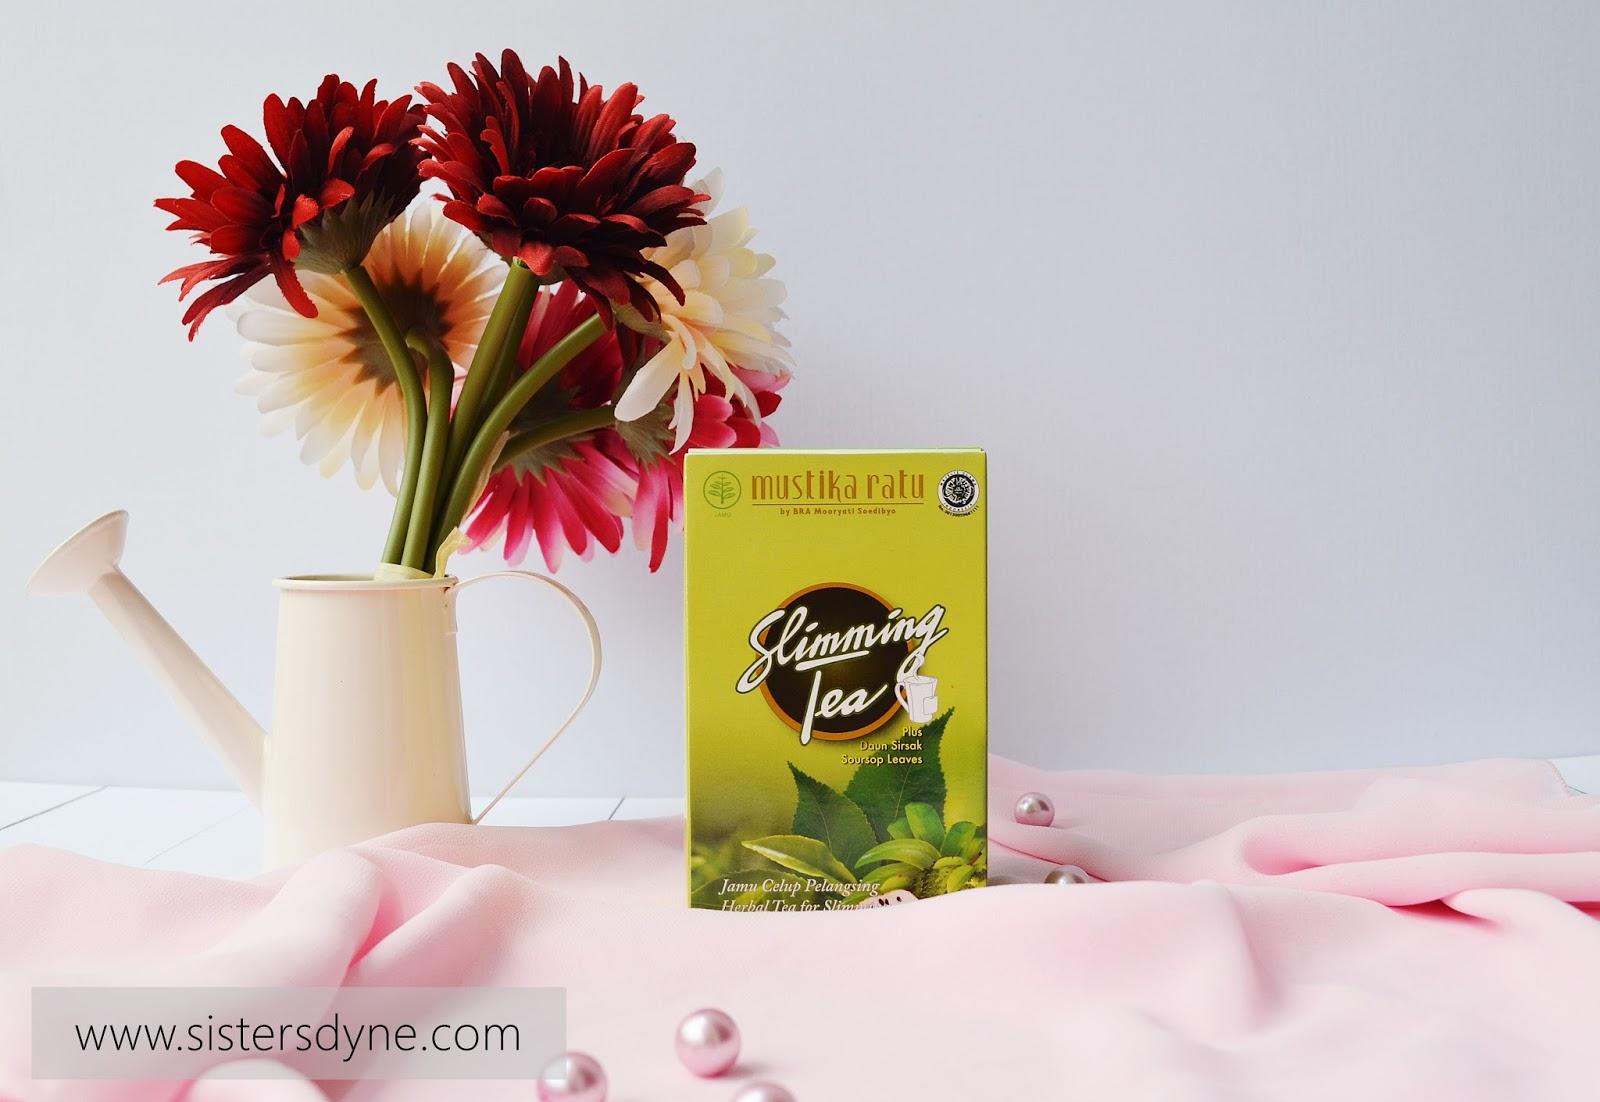 cara minum my slimming tea